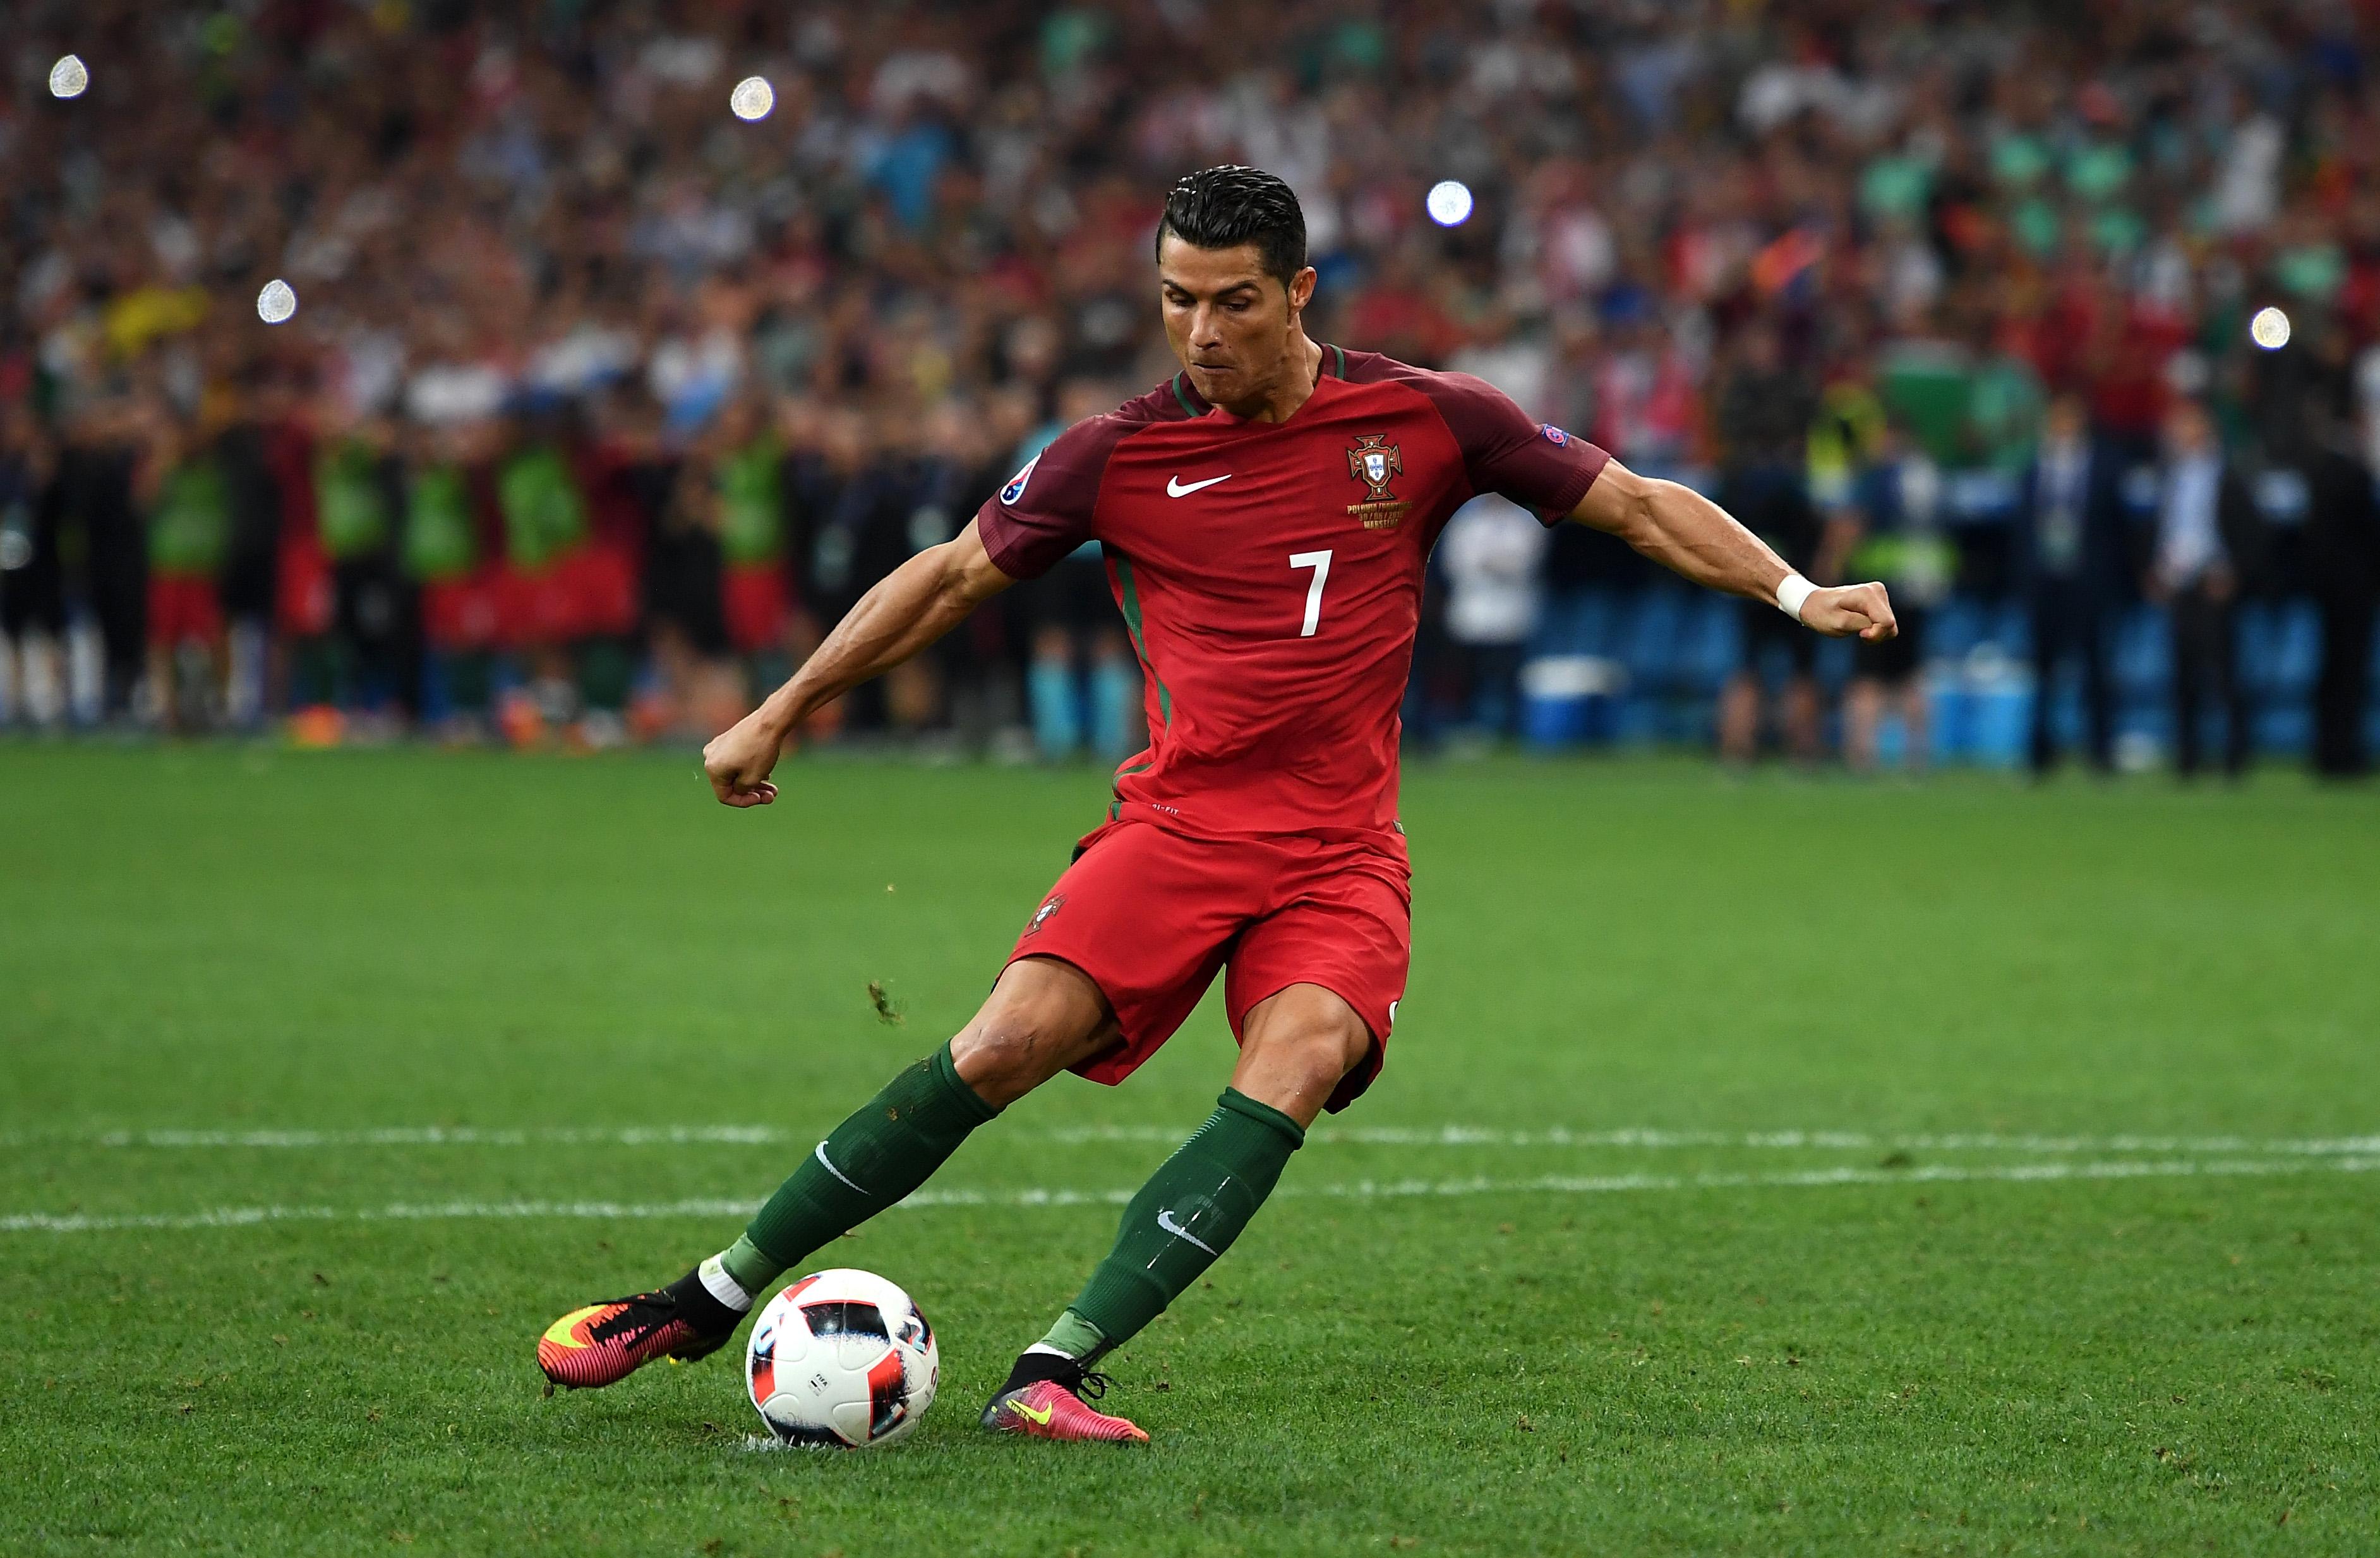 Ronaldo 2005 rape claim